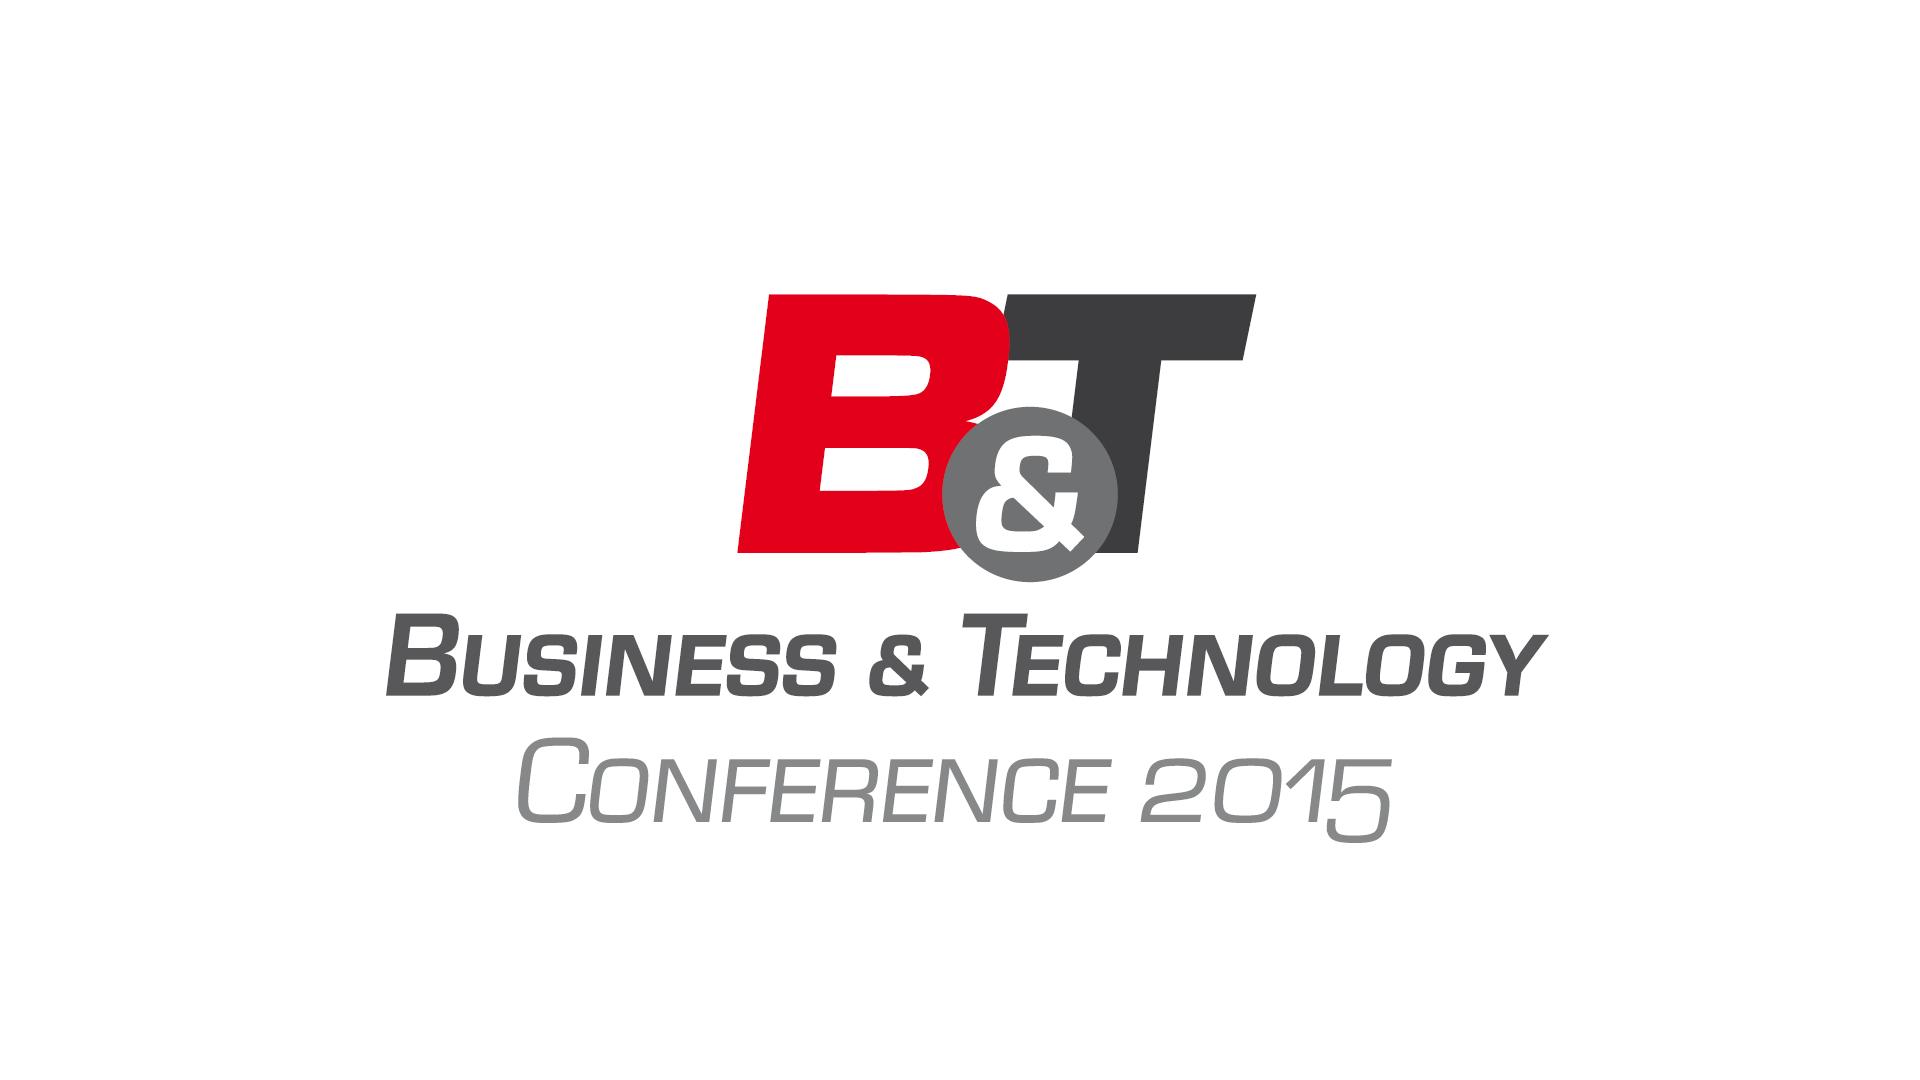 AB: konferencja o technologii i biznesie